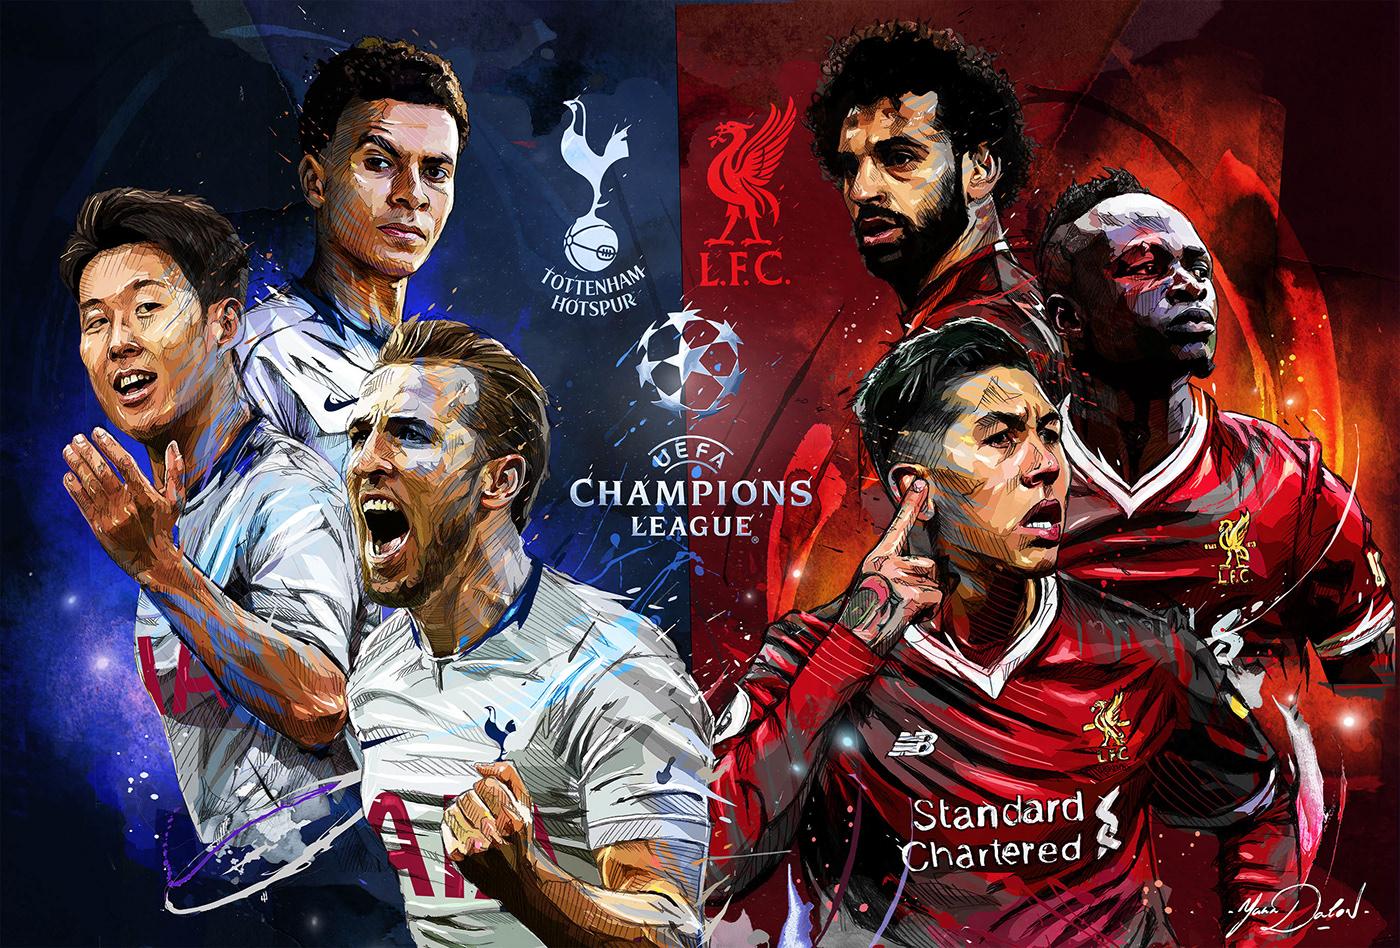 FINAL CHAMPIONS LEAGUE 2019 Liverpool vs Tottenham on Behance